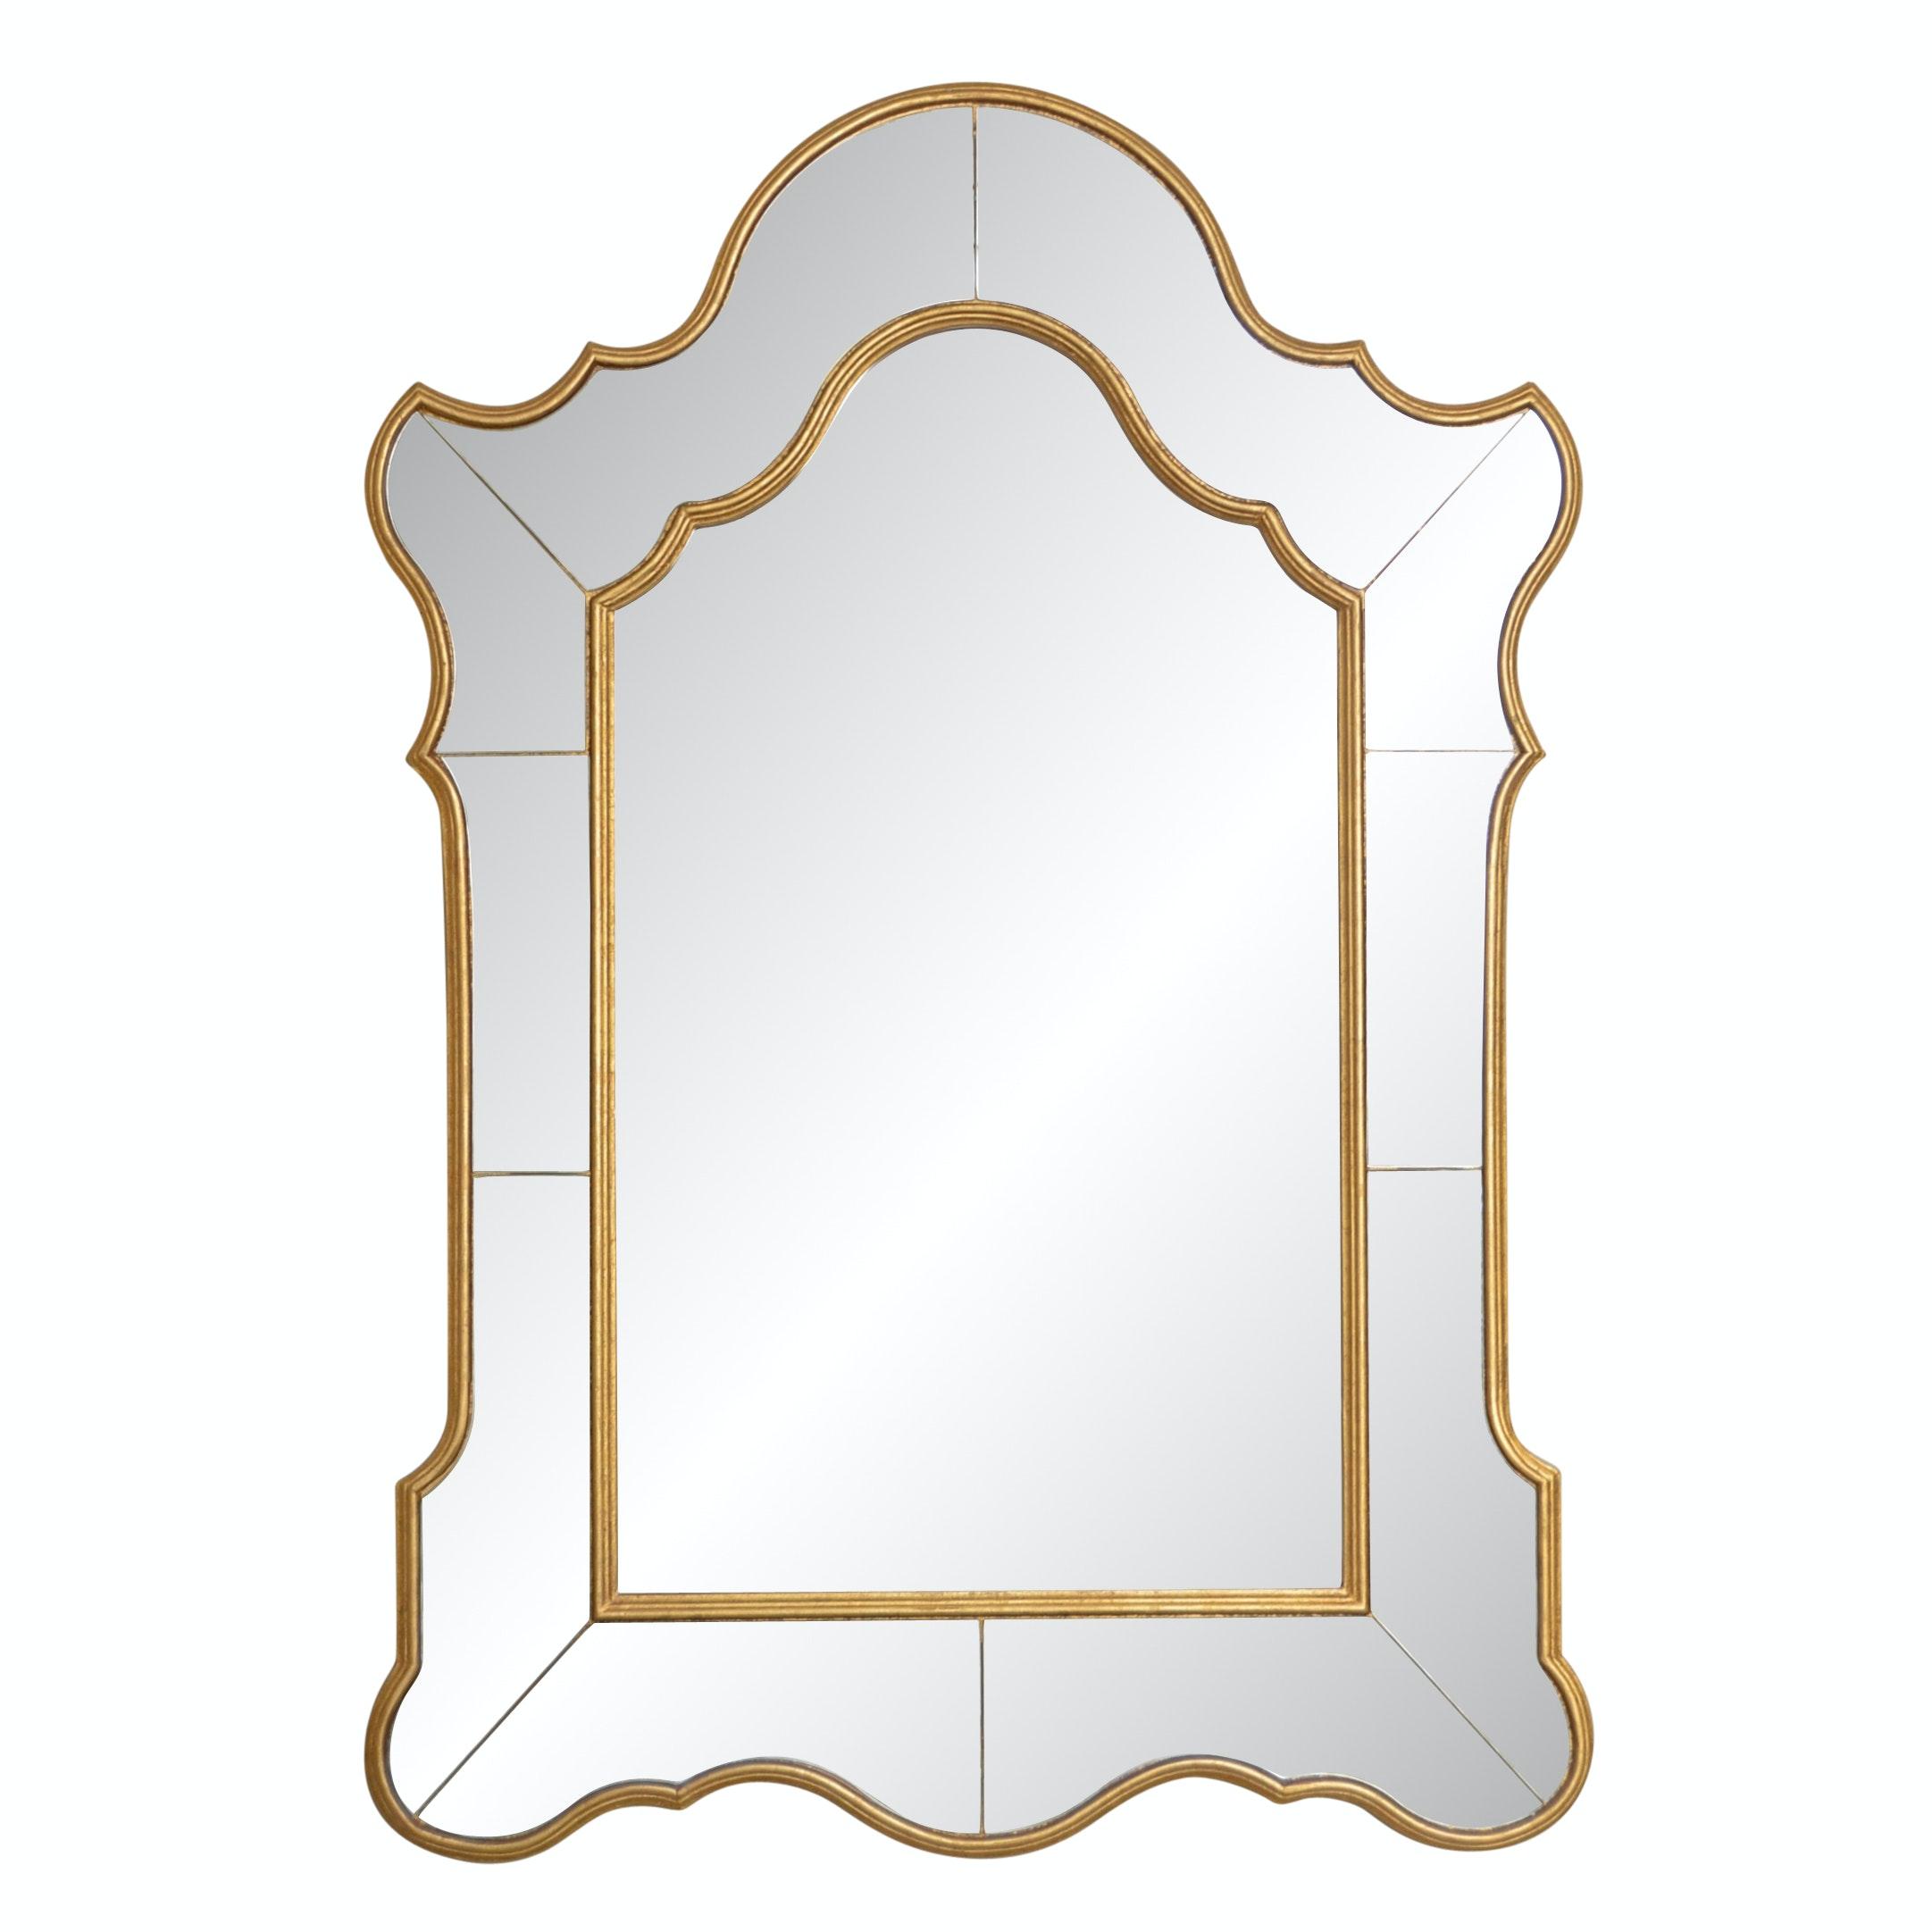 Louis XV Style Wall Mirror